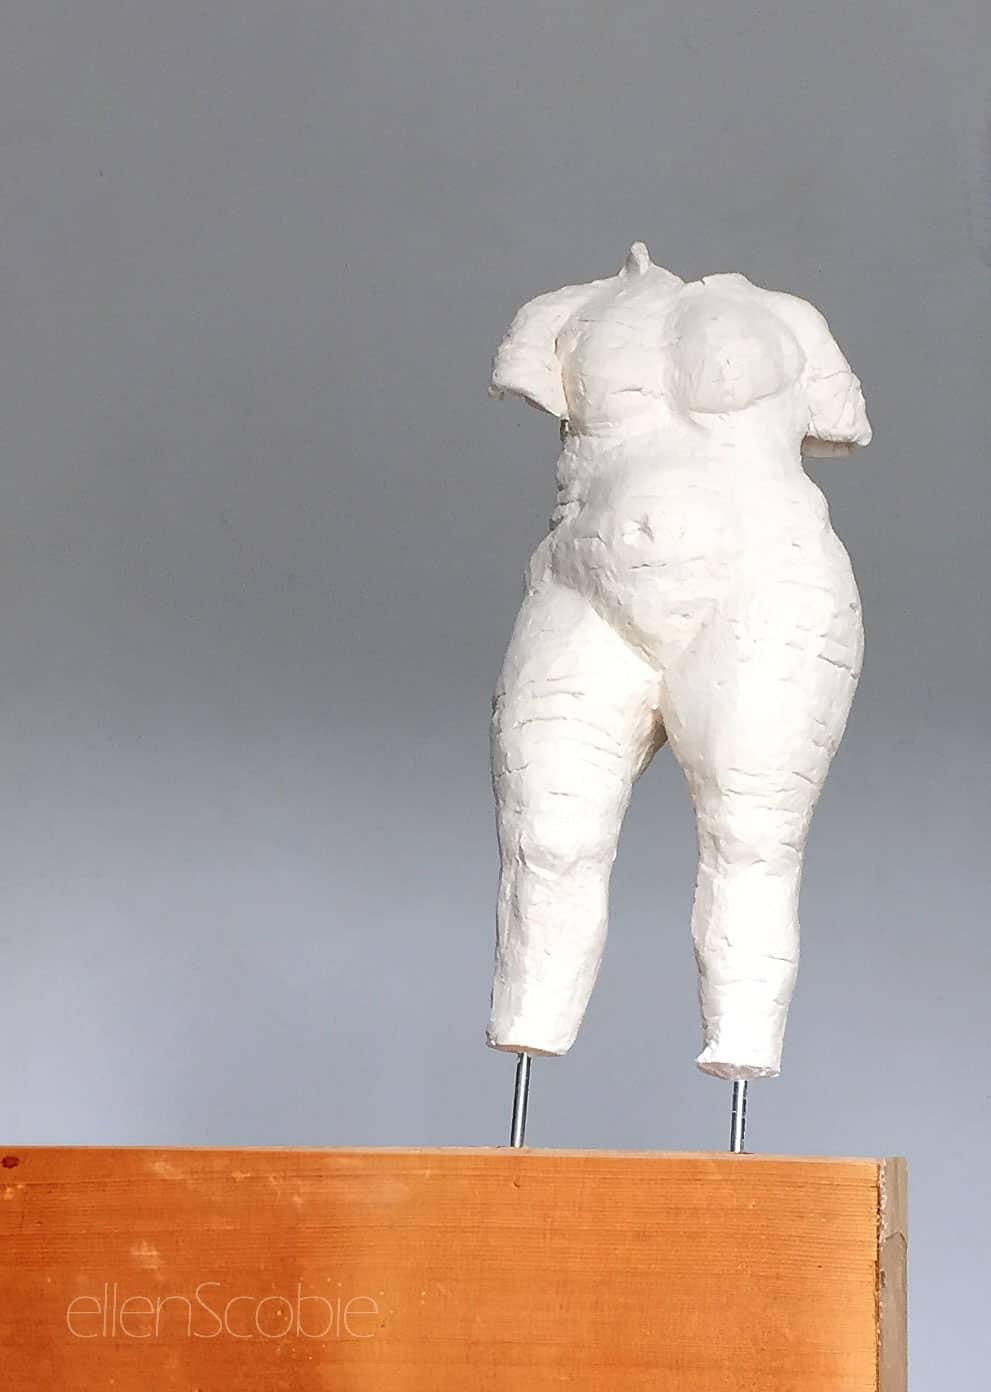 coil-terracotta-sculpture-female-figure-ellen-scobie